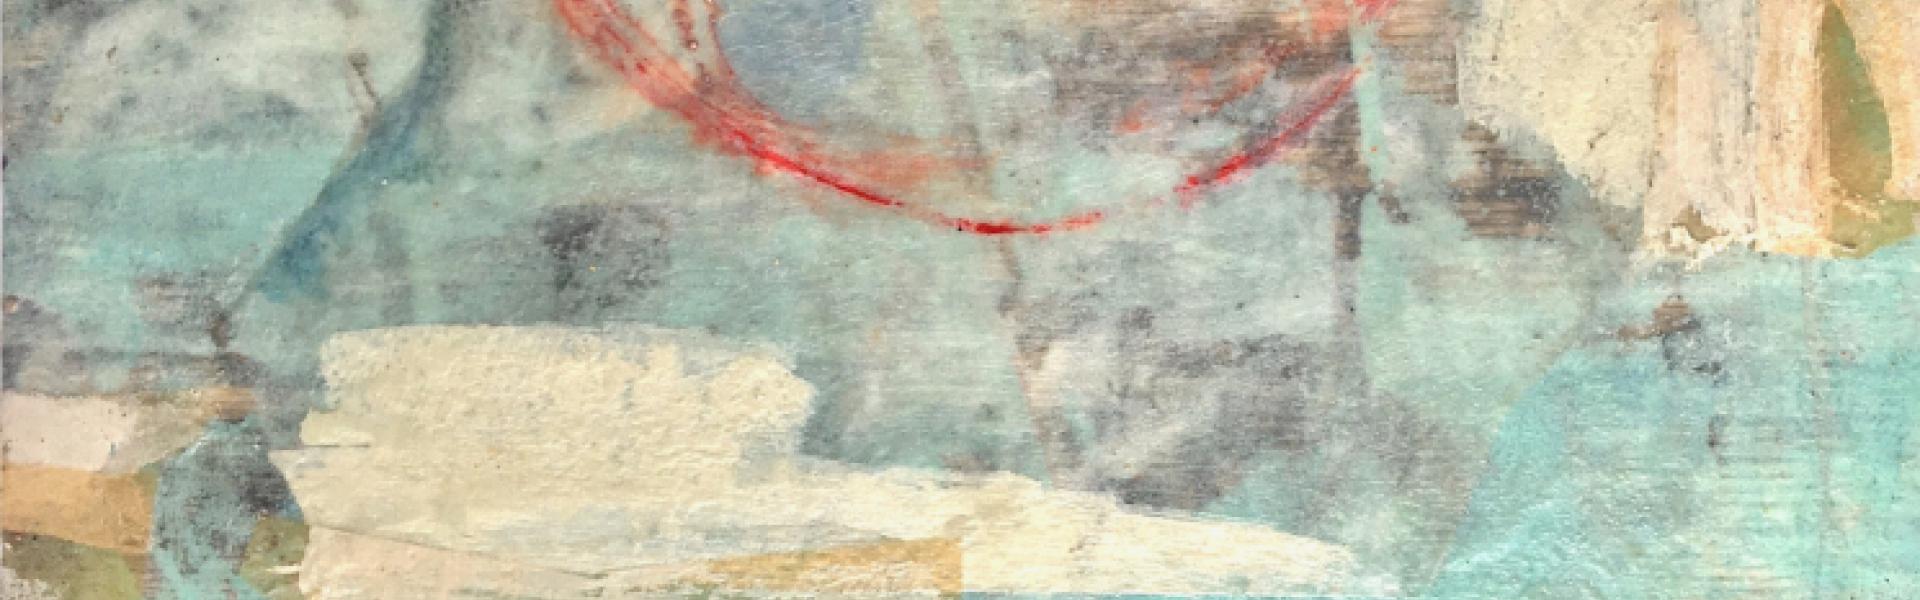 banner_Piece-R-bluer.20210528200315.jpeg